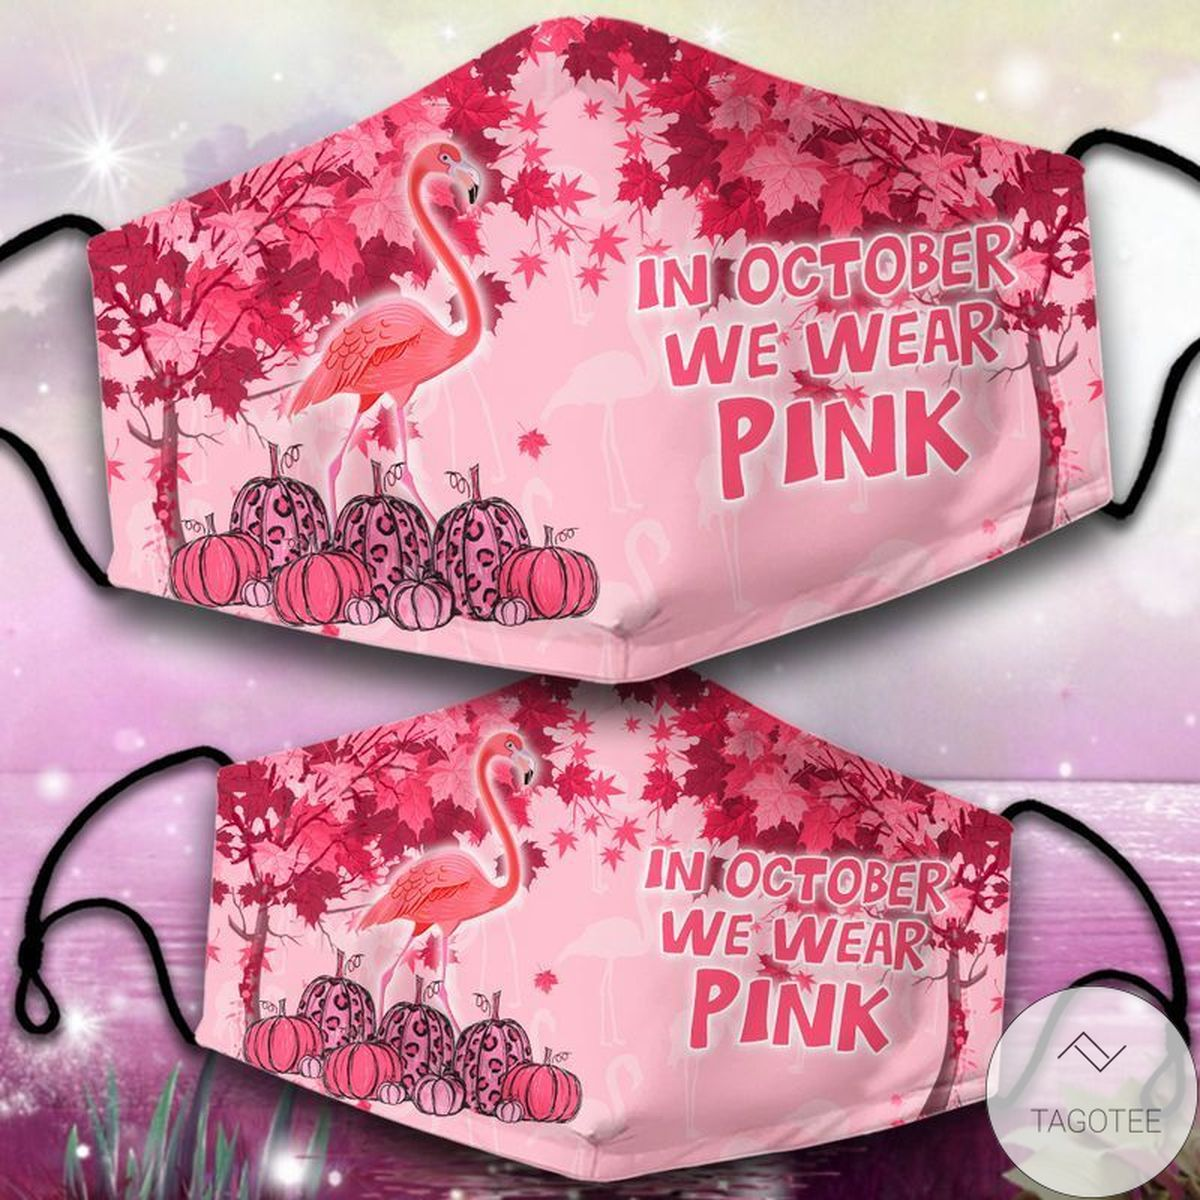 In October We Wear Pink Flamingo Face Mask